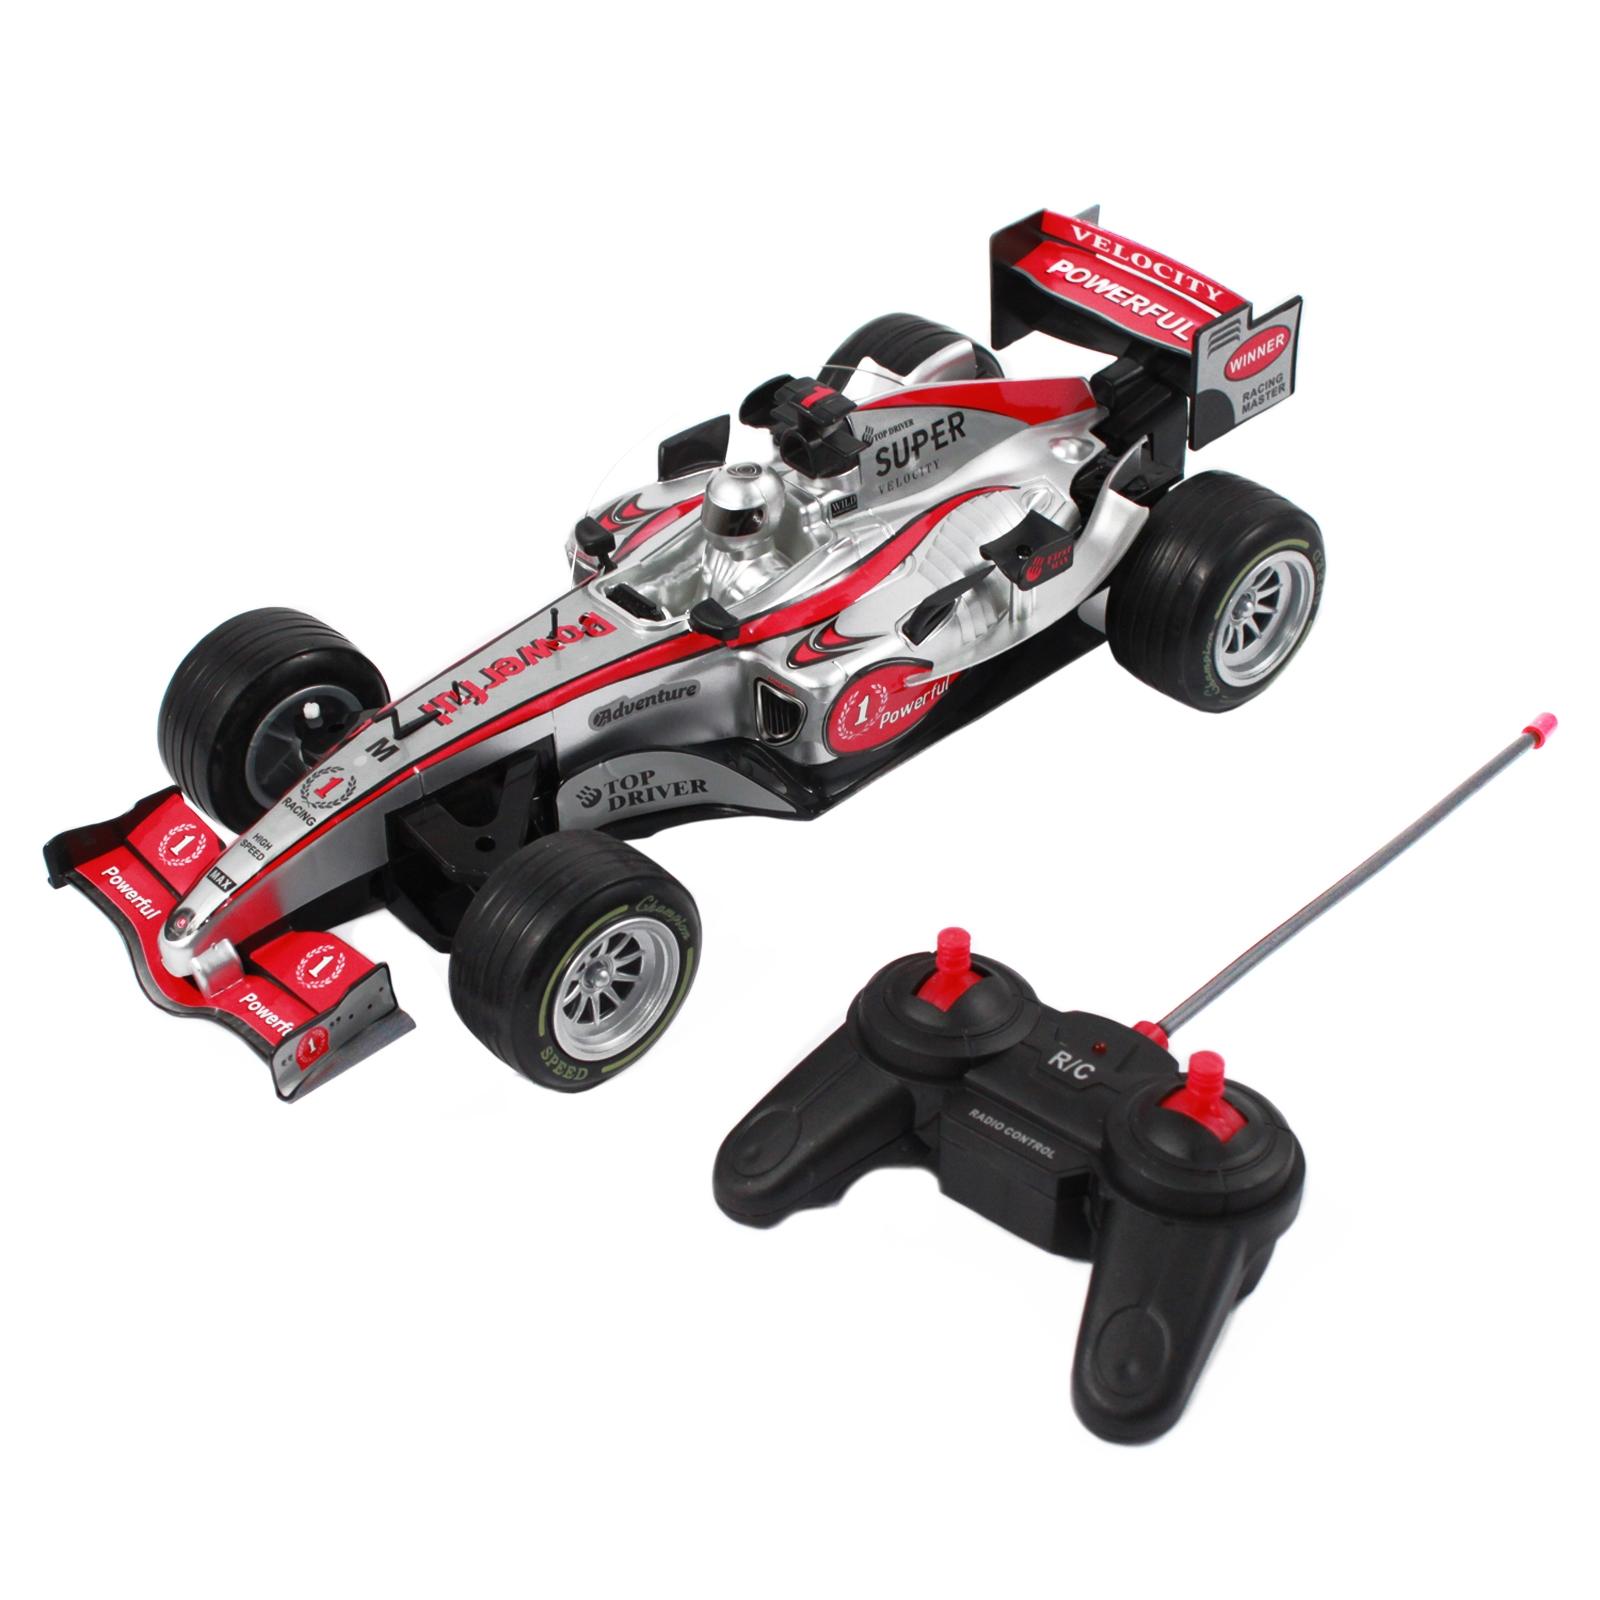 Mobil Remote Control Sebagai Mainan Anak - Perkembangan Teknologi Mobil Remote Control, Dari Sekadar Mainan Jadi Sarana Adu Kecepatan